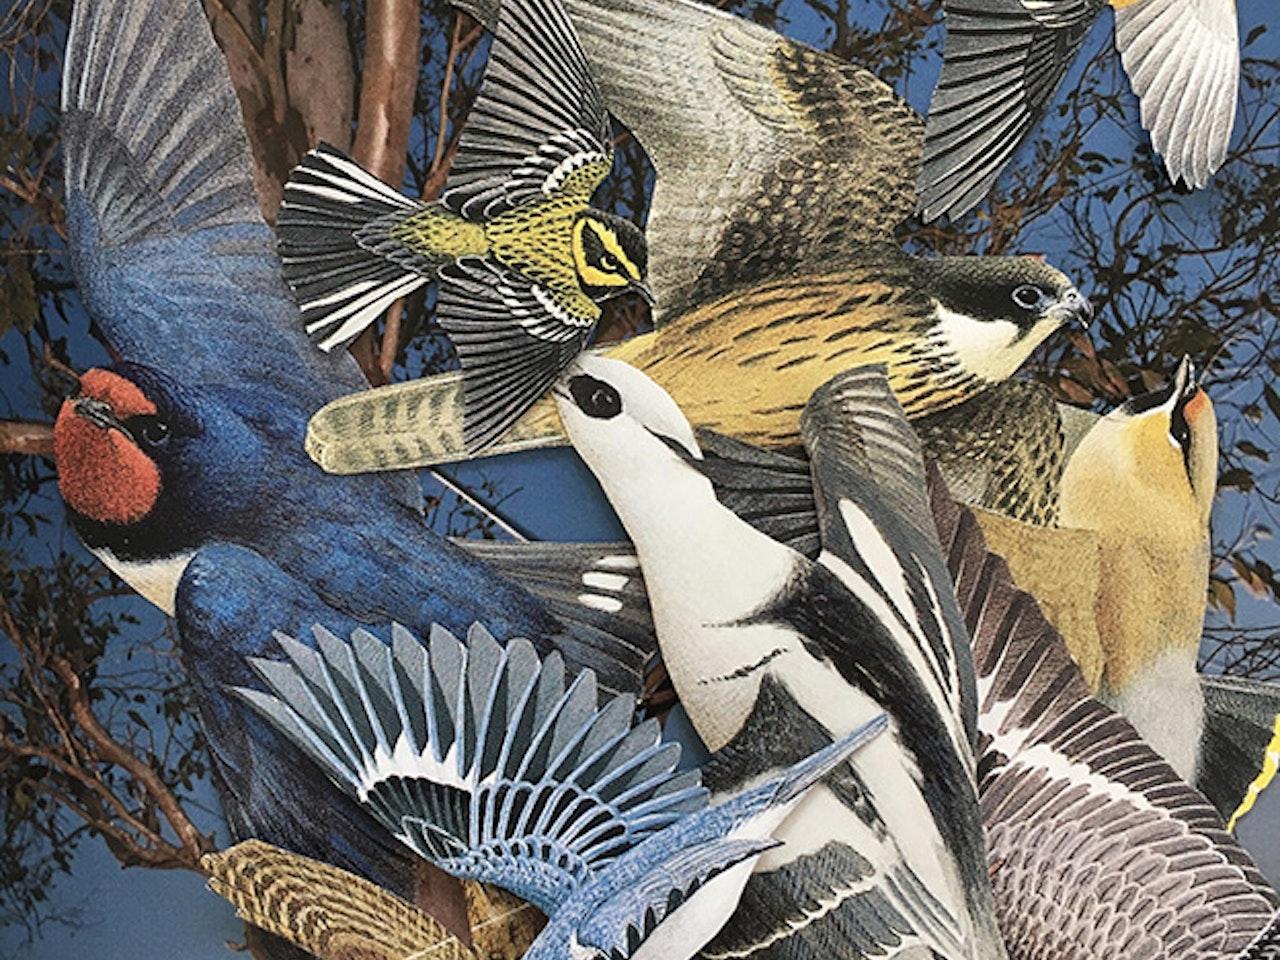 Ornitholorgy